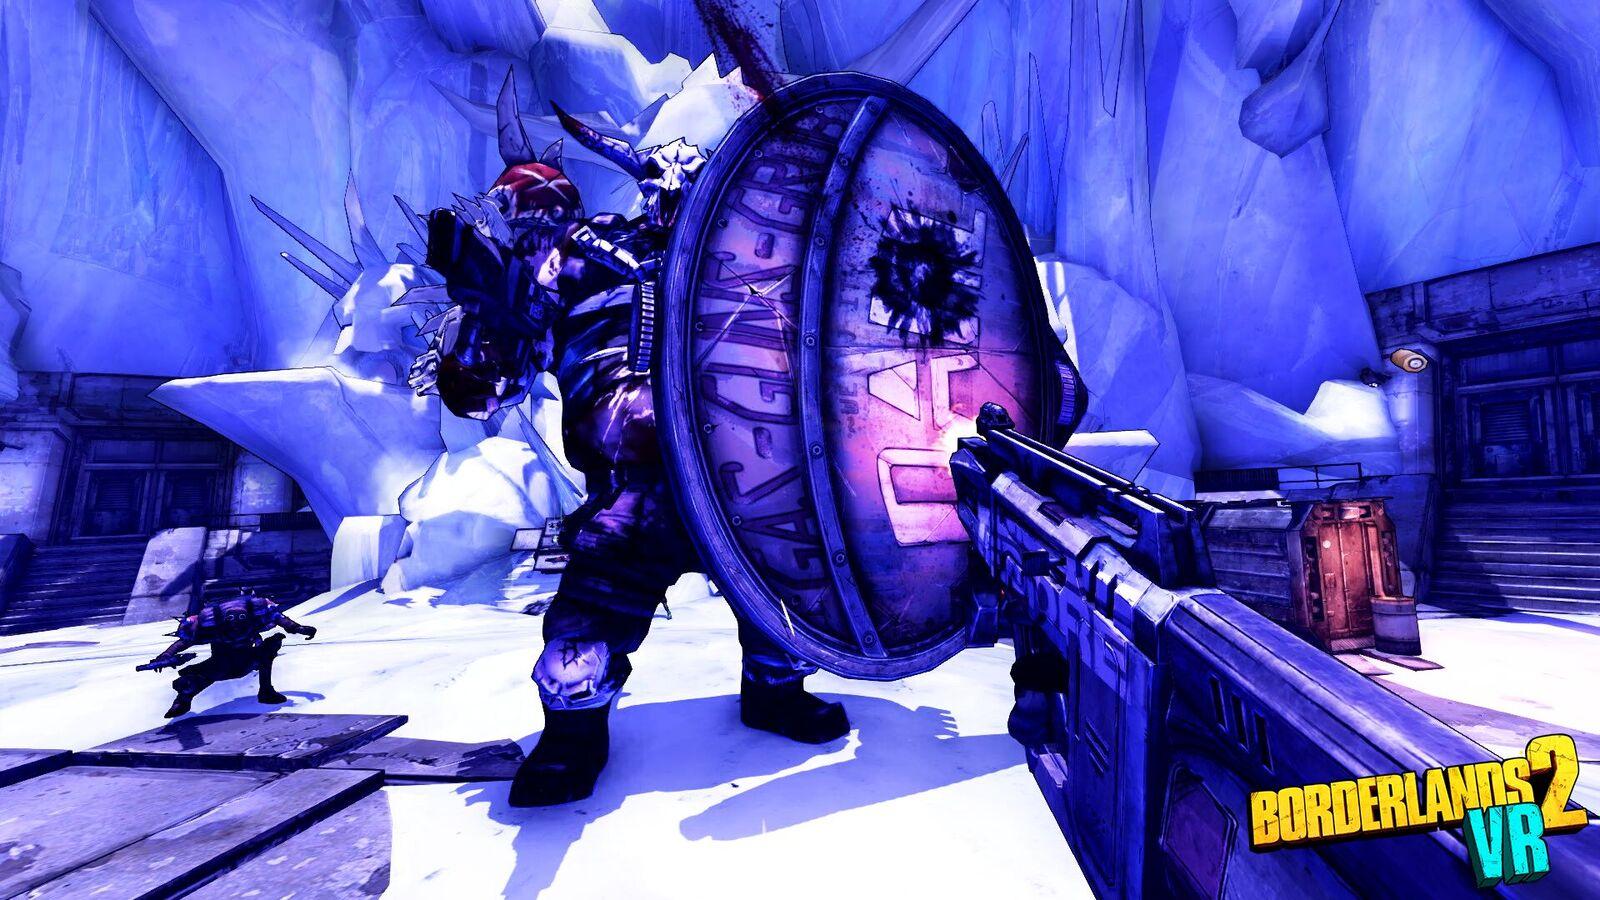 Borderlands 2 VR Screen